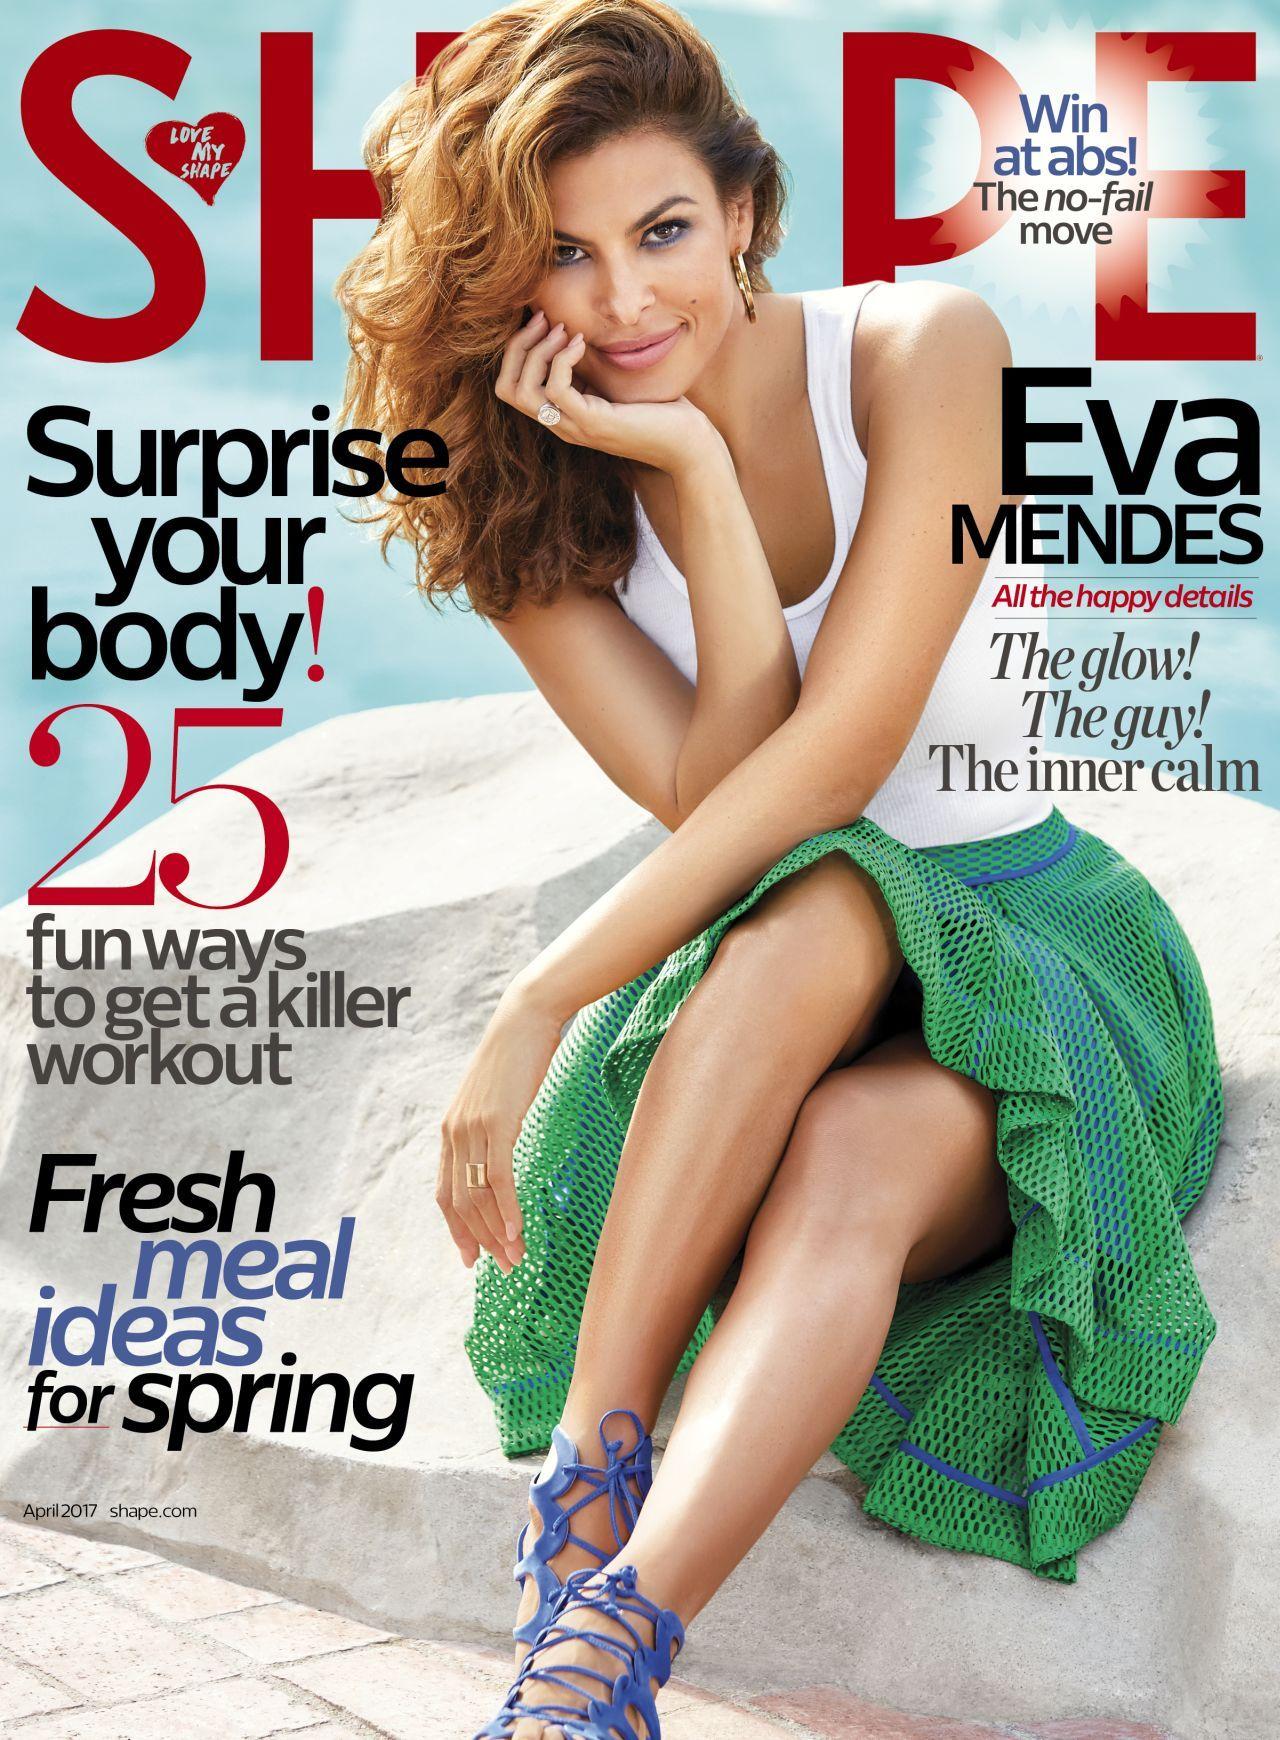 Eva Mendes - Shape Magazine 2017/April Cover